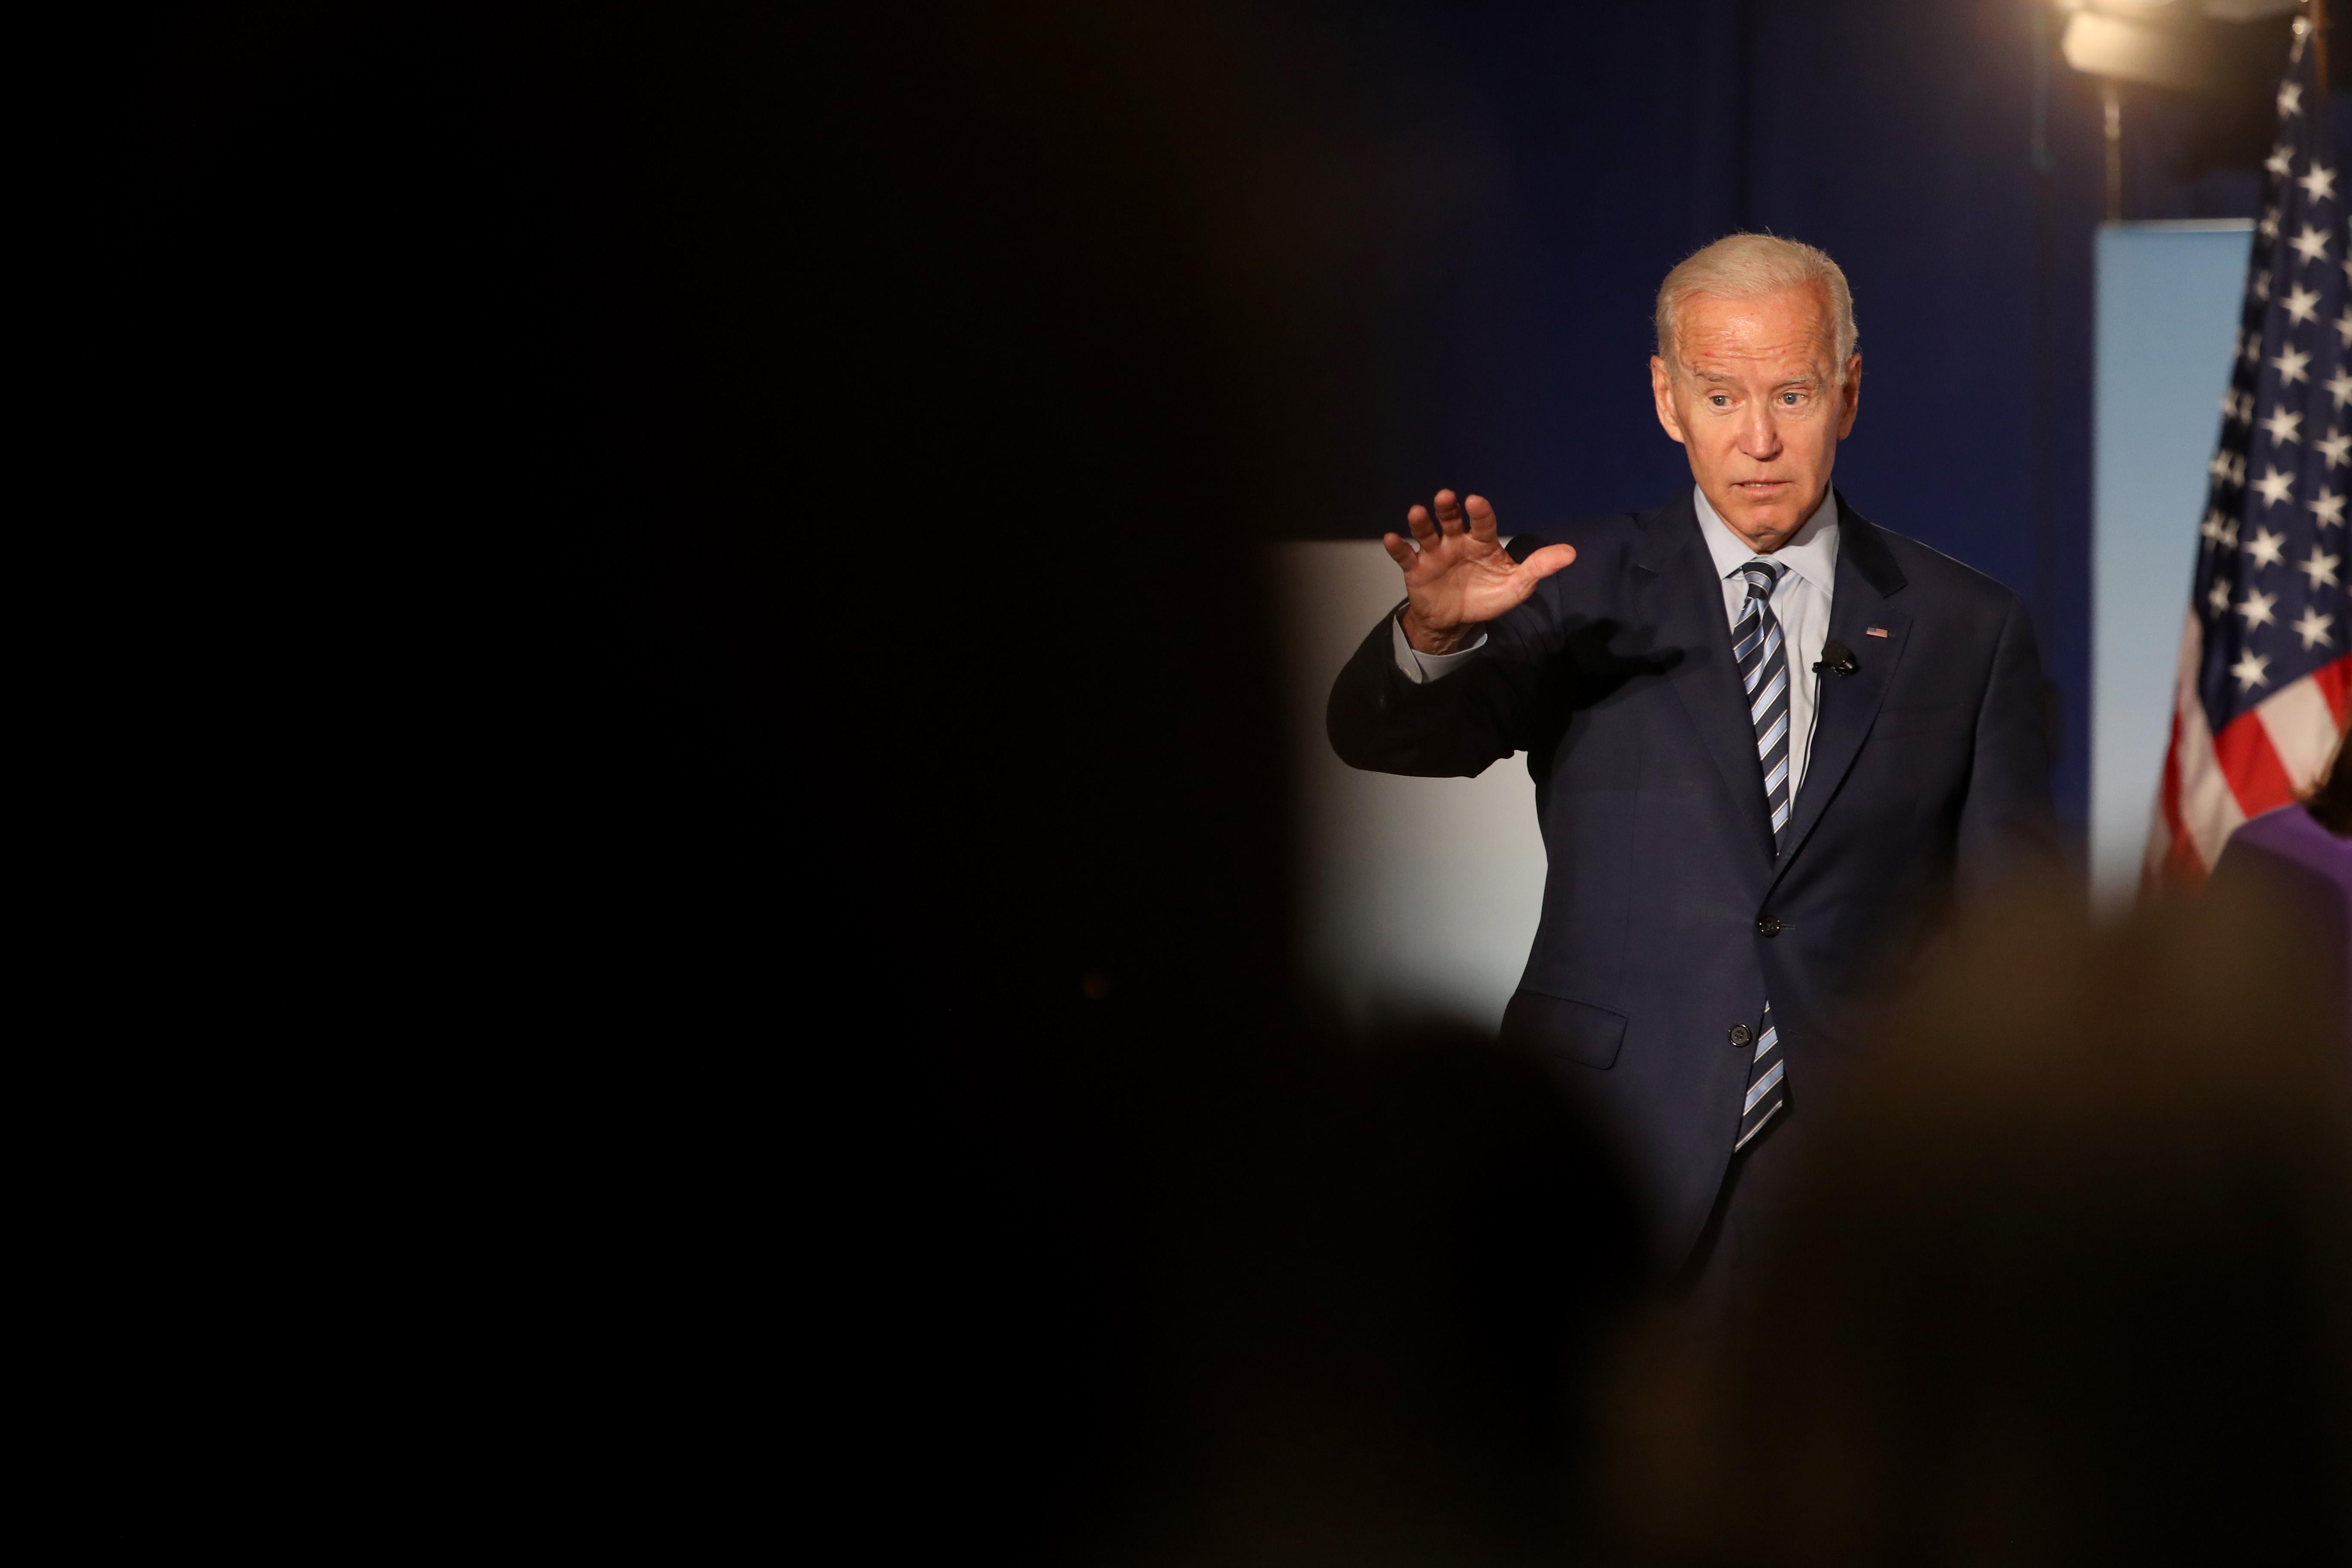 Democratic presidential candidate Joe Biden onstage.